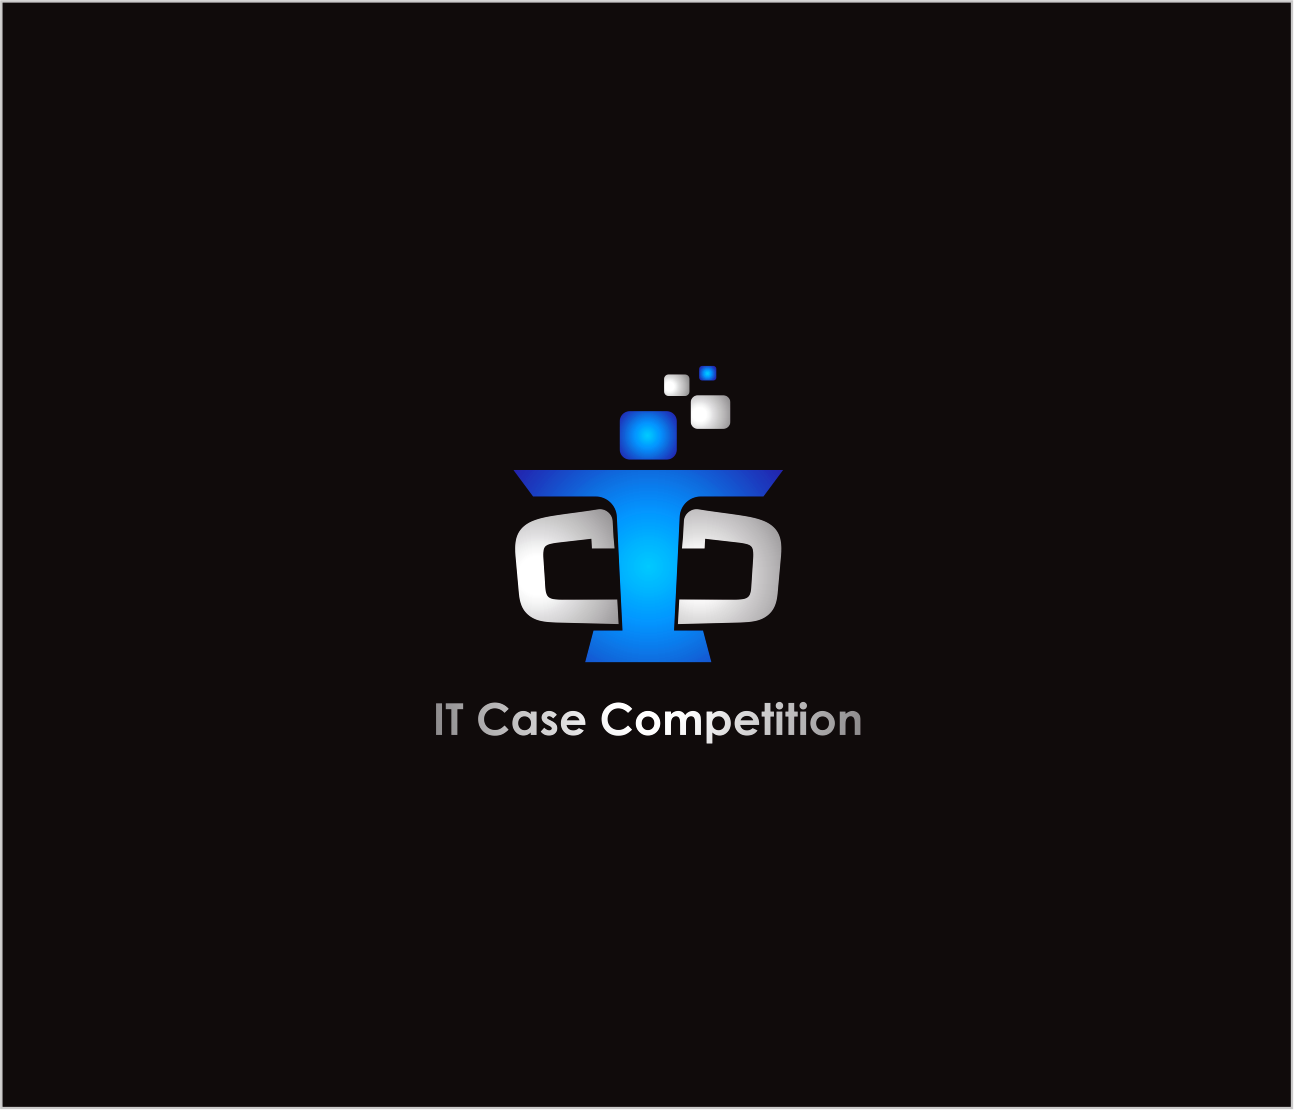 Logo Design by Armada Jamaluddin - Entry No. 116 in the Logo Design Contest Inspiring Logo Design for ITCC.